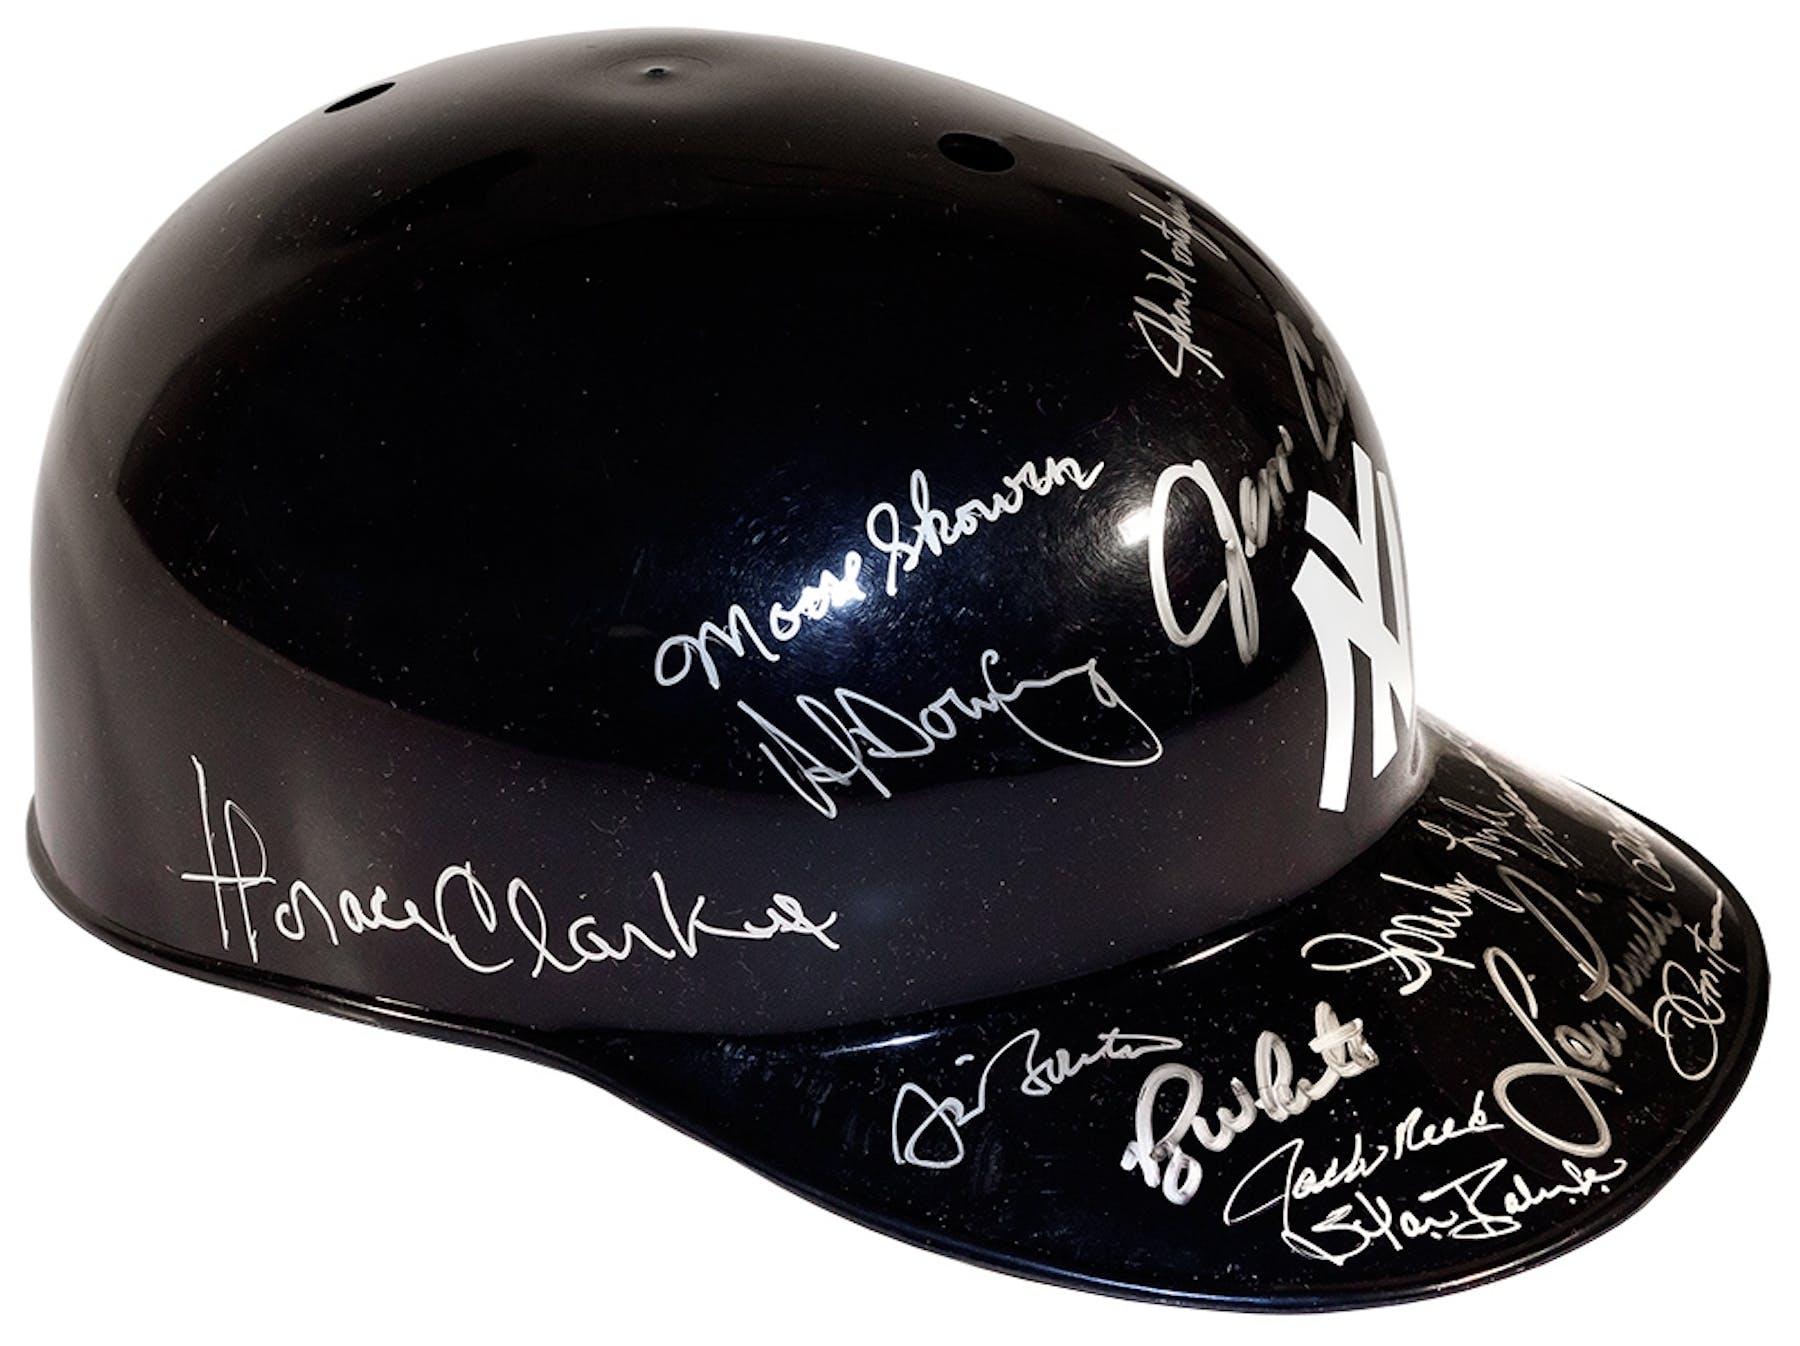 5e5f88777ee New York Yankees Autographed Multi-Signed Hard Hat Helmet (JSA ...